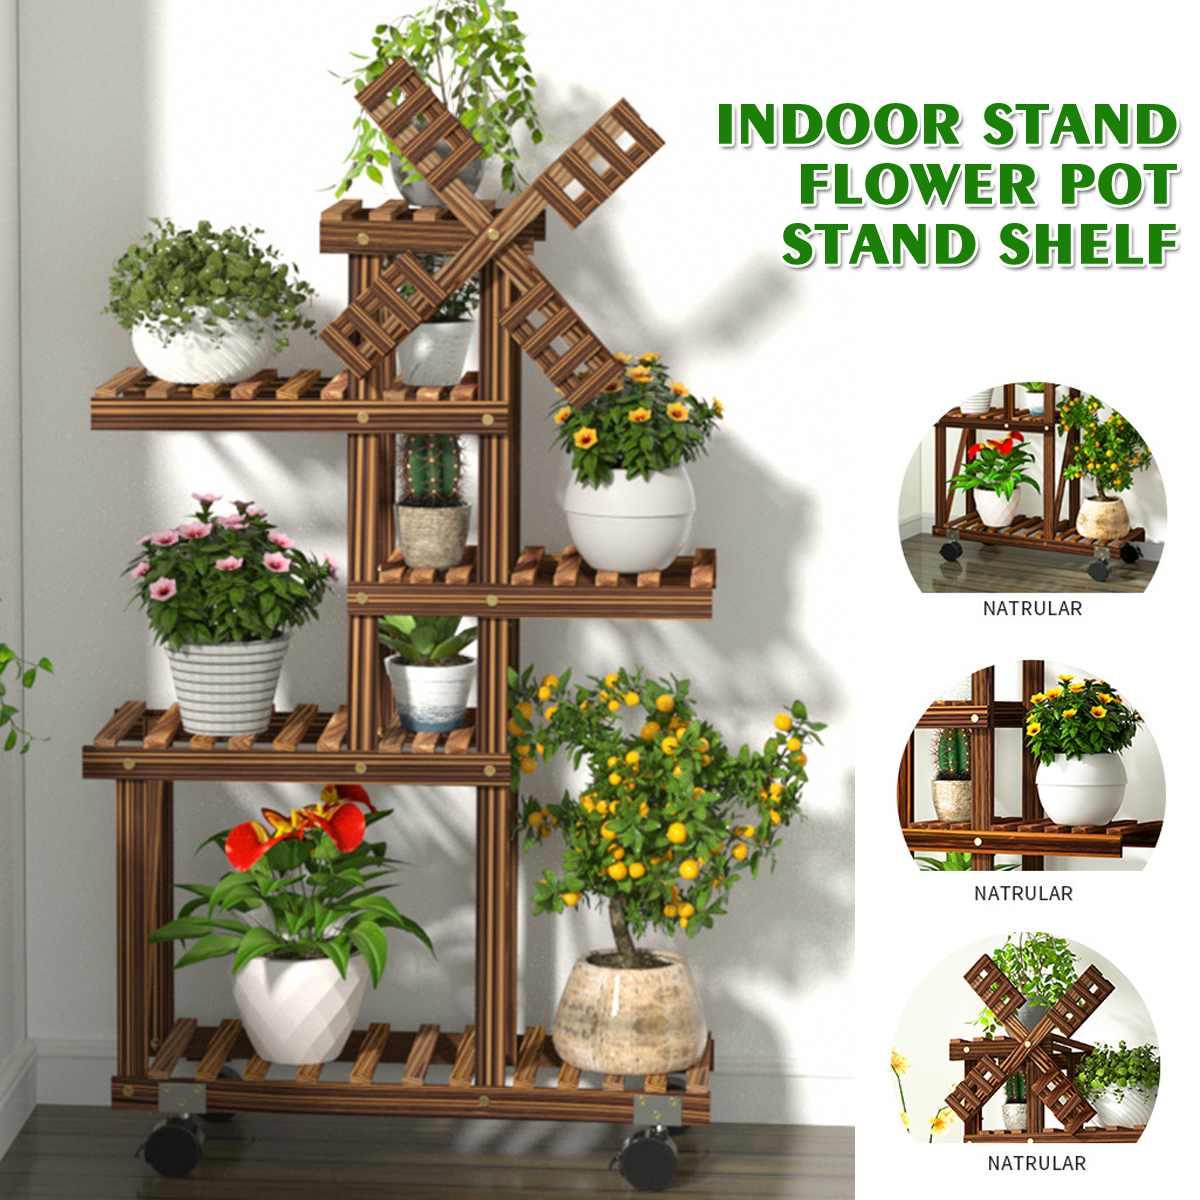 Estante de madera para flores estante para plantas estante para exhibición de bonsái jardín interior exterior Patio balcón soportes de flores estanterías para plantas